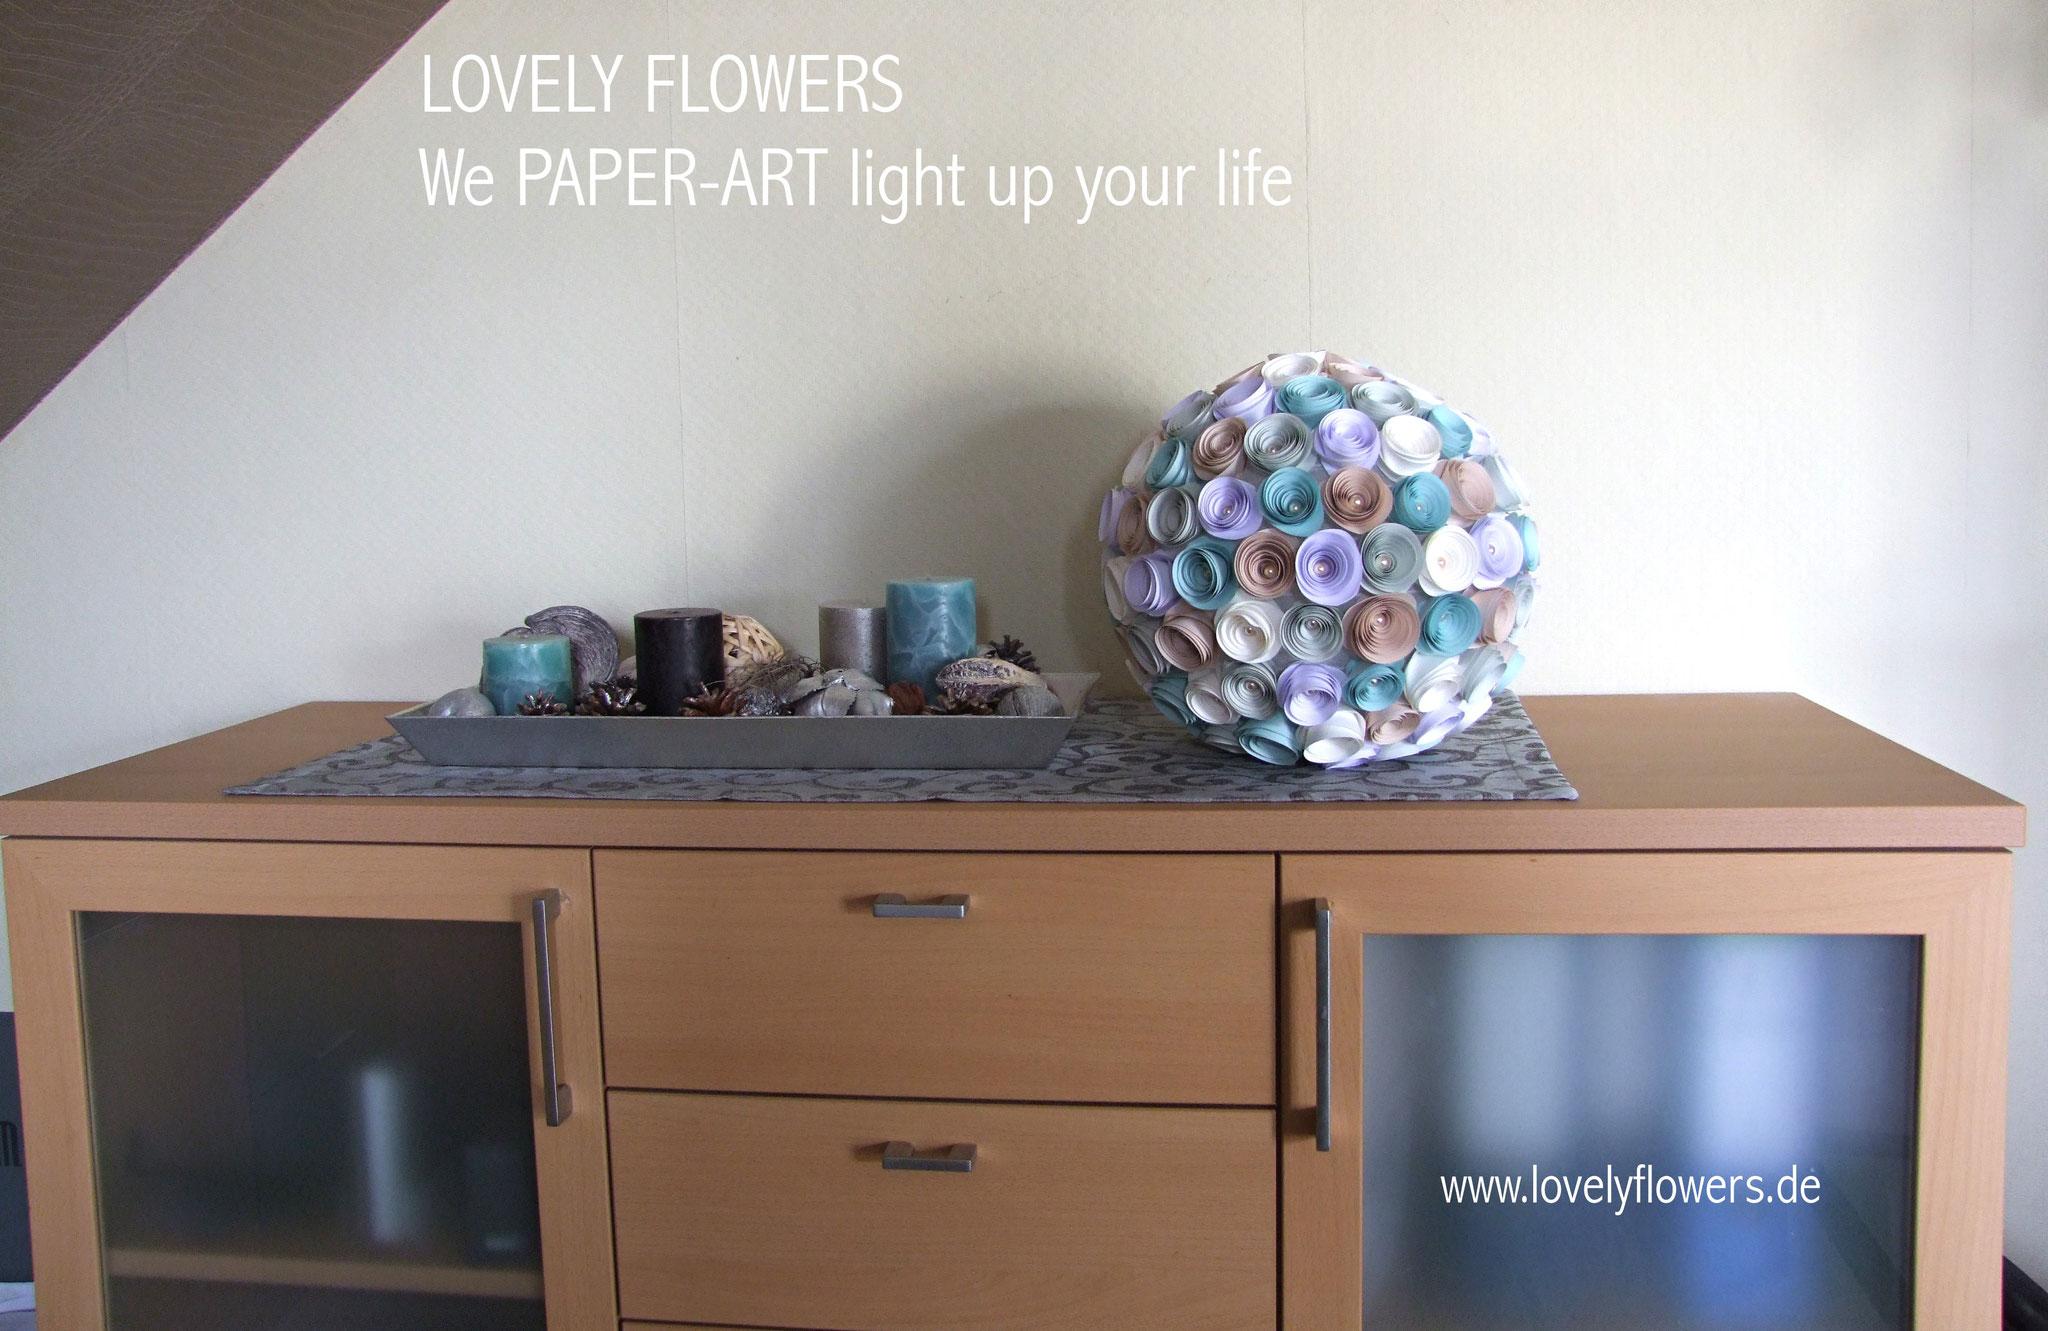 www.lovelyflowers.de - Paper Art Lampen kannst Du überall dekorieren!